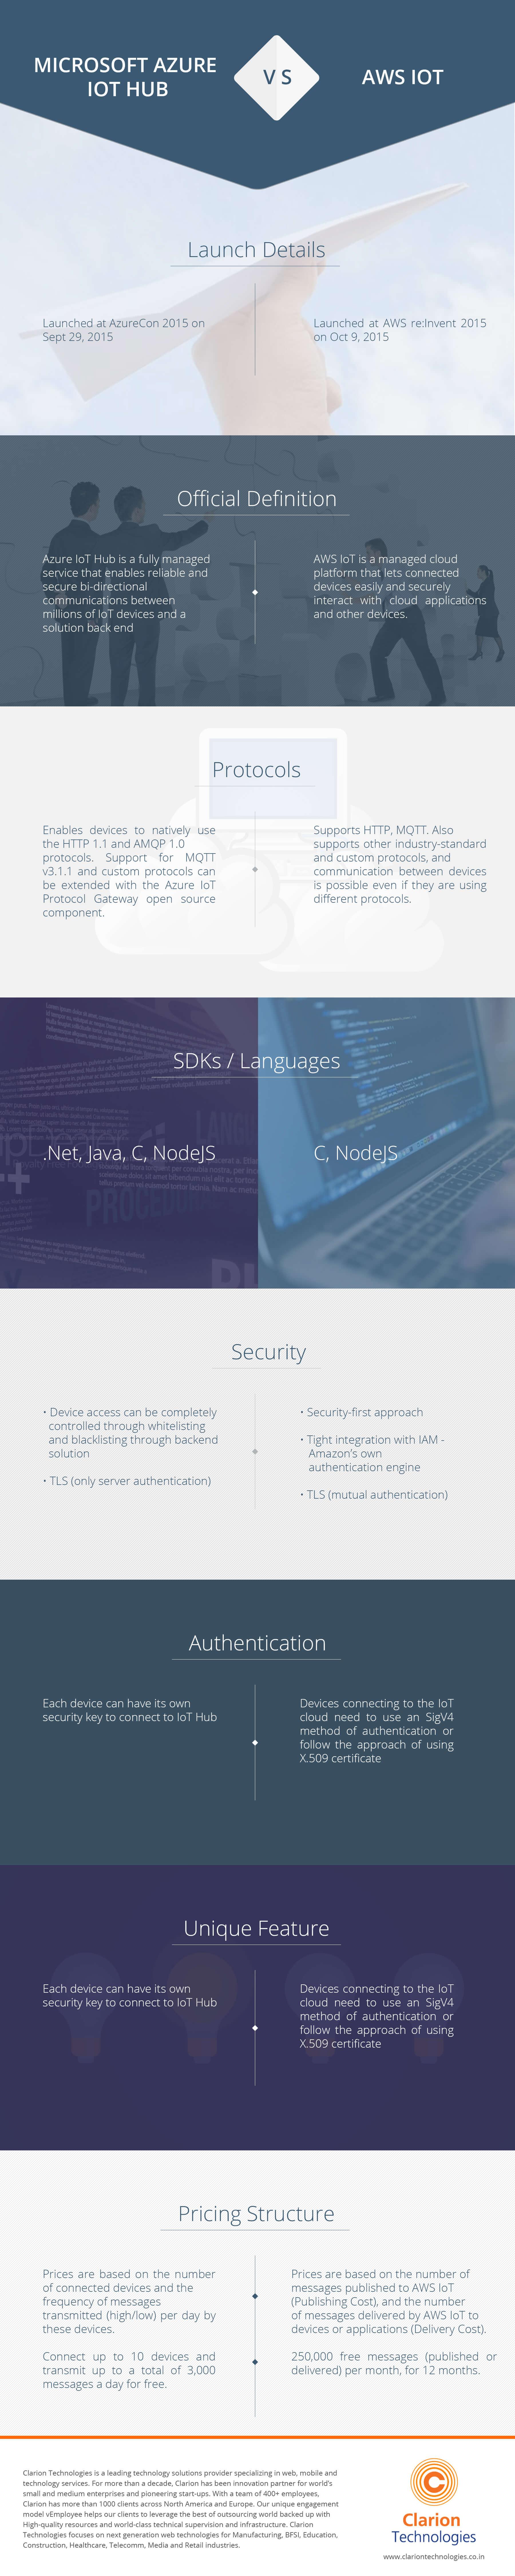 Microsoft Azure IoT hub vs AWS IoT